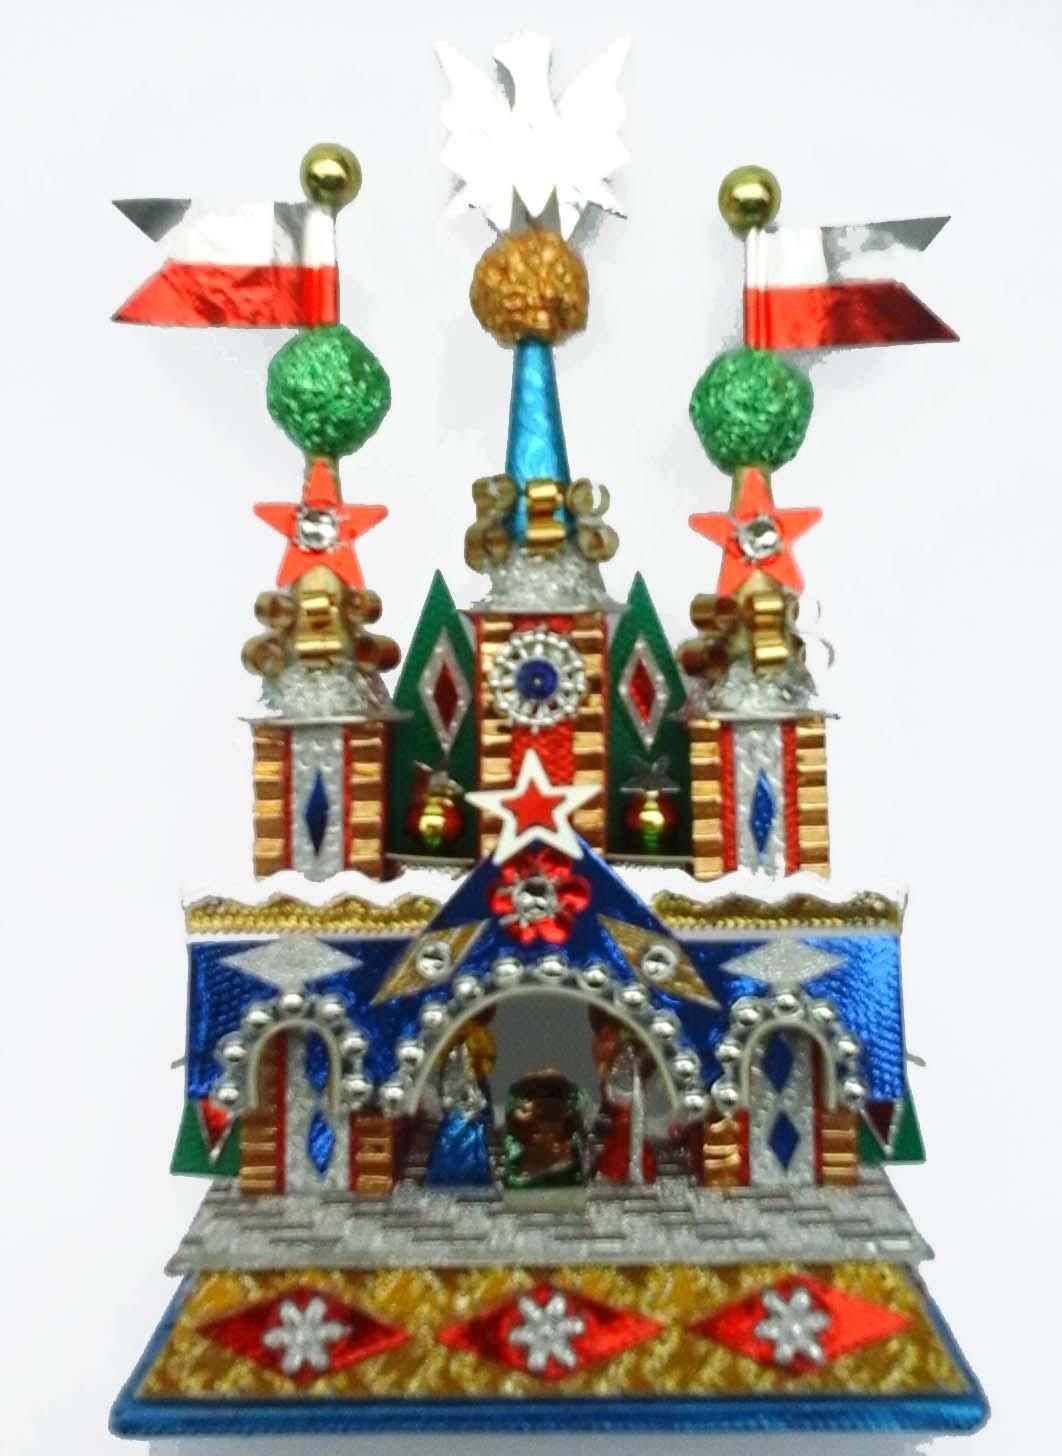 Krakow Nativity with stars and Swarovski crystals